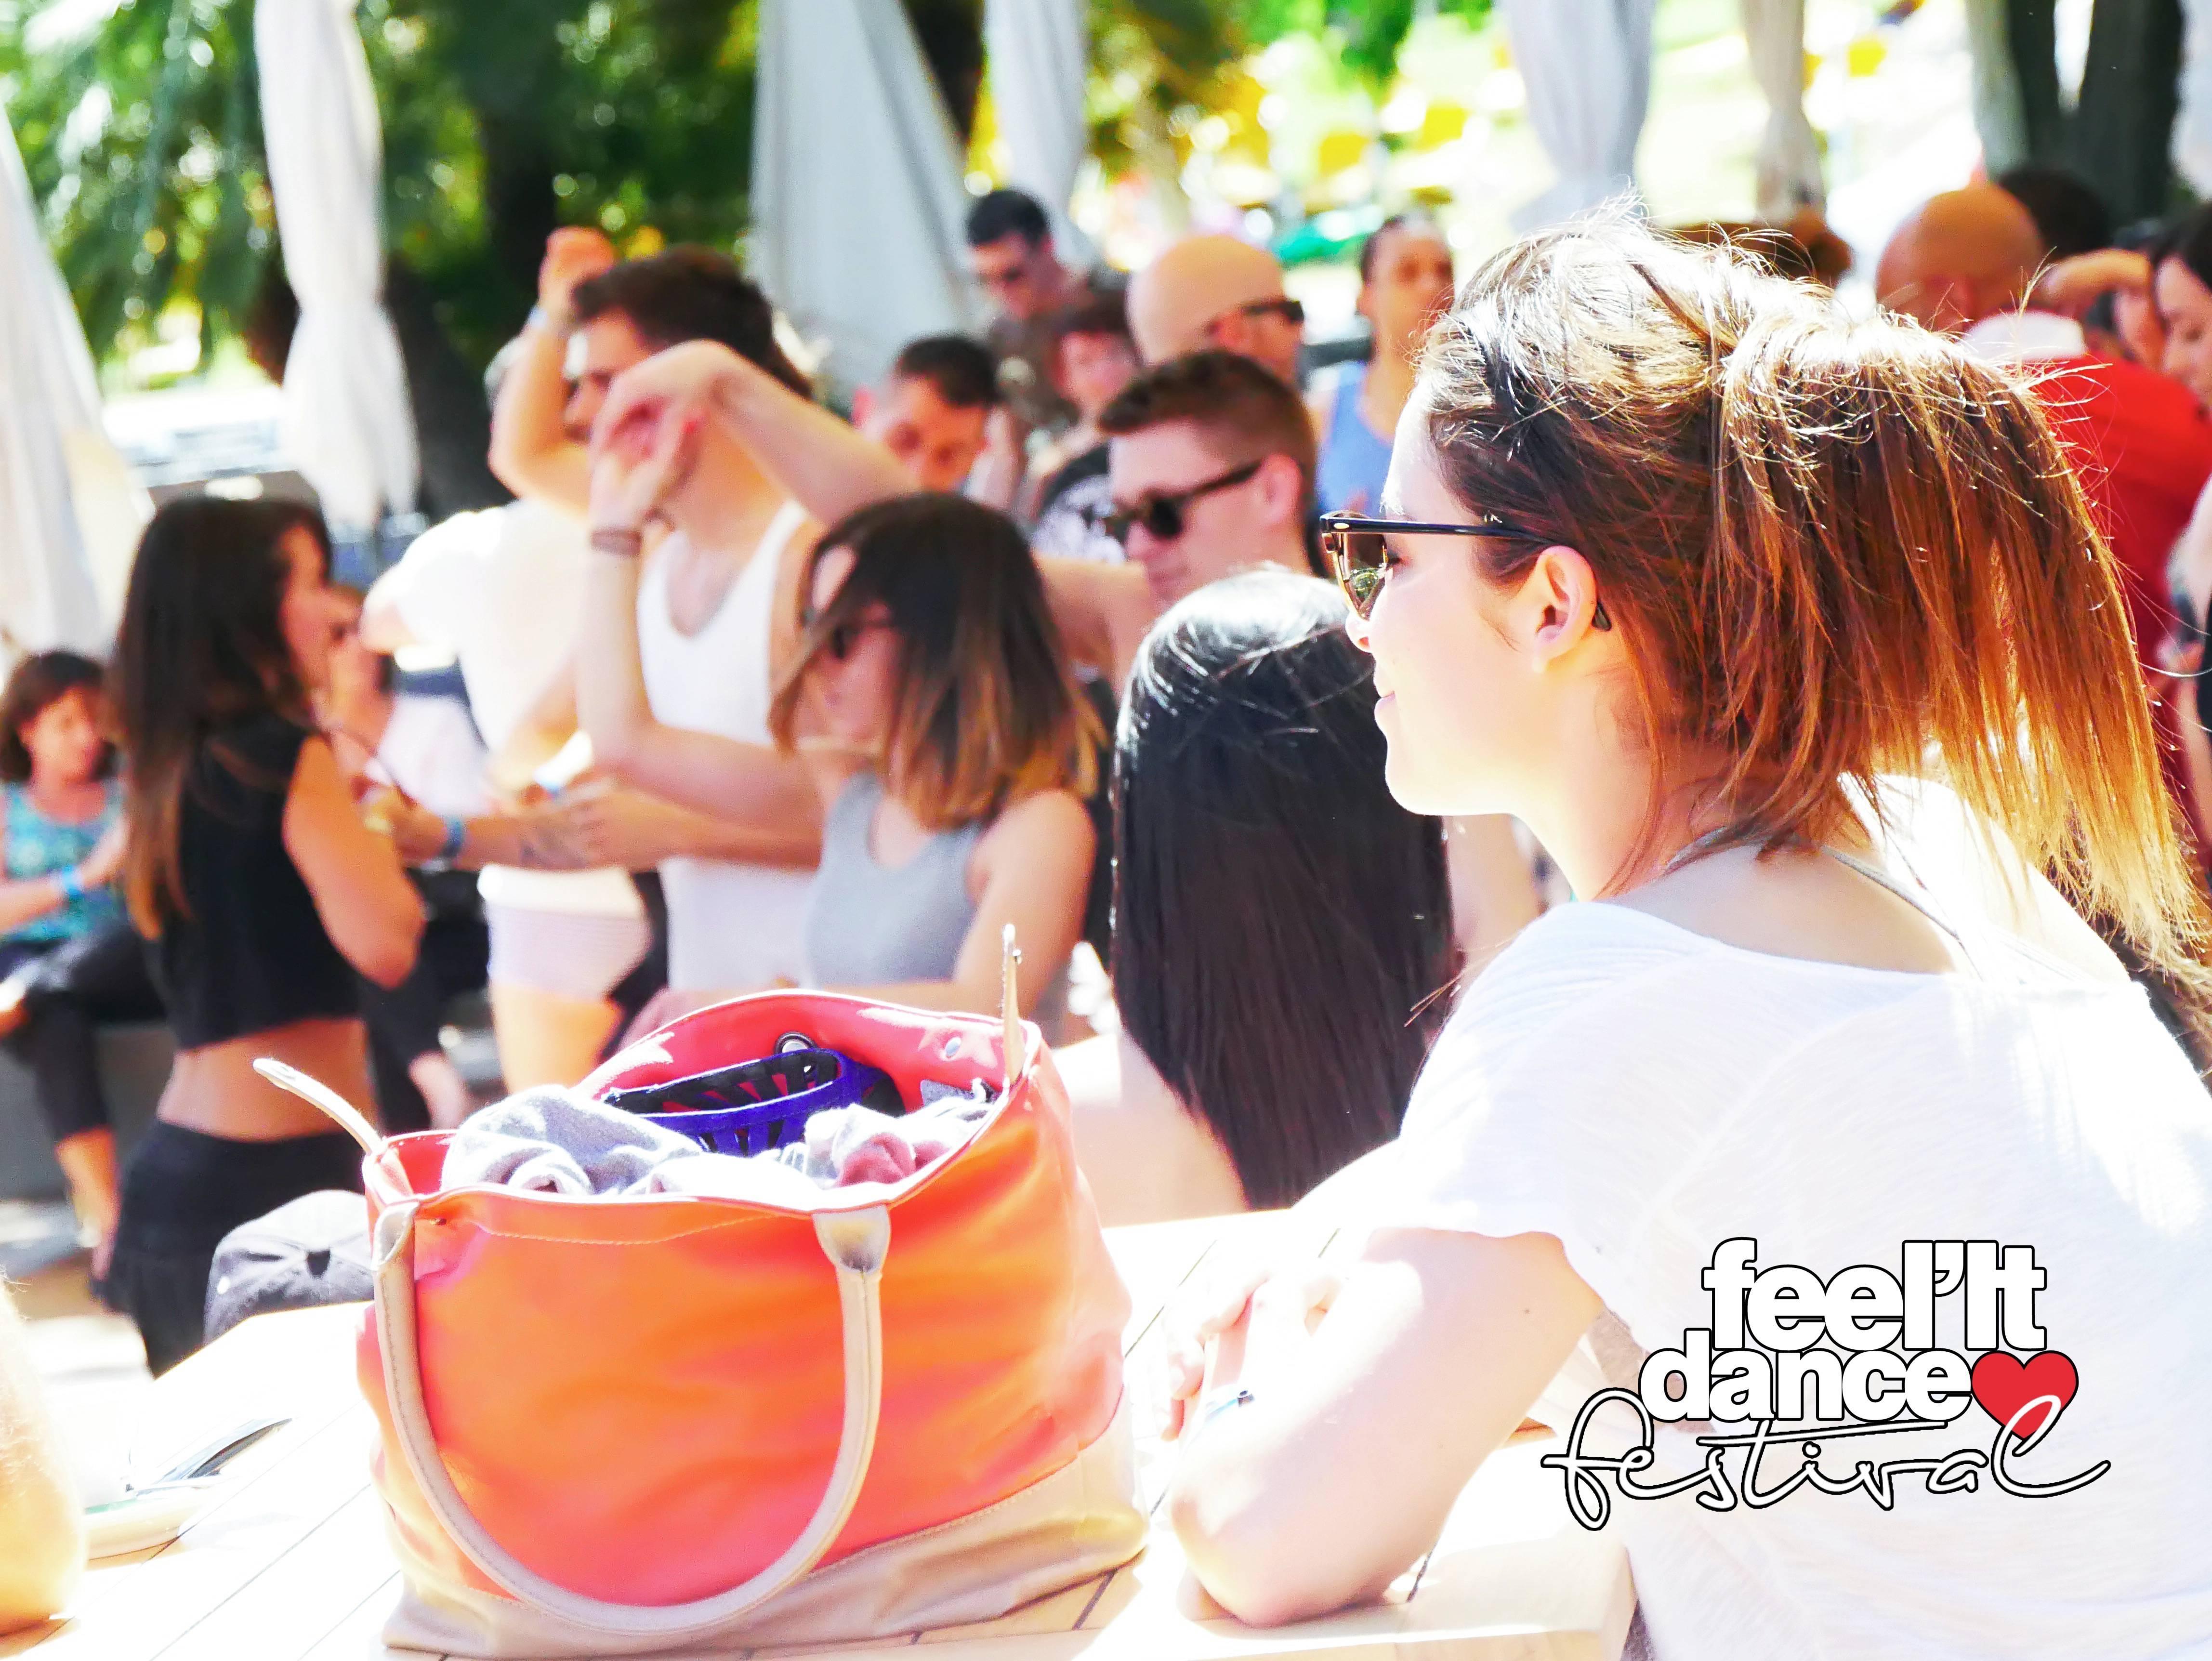 FeelitDanceFestival - 139